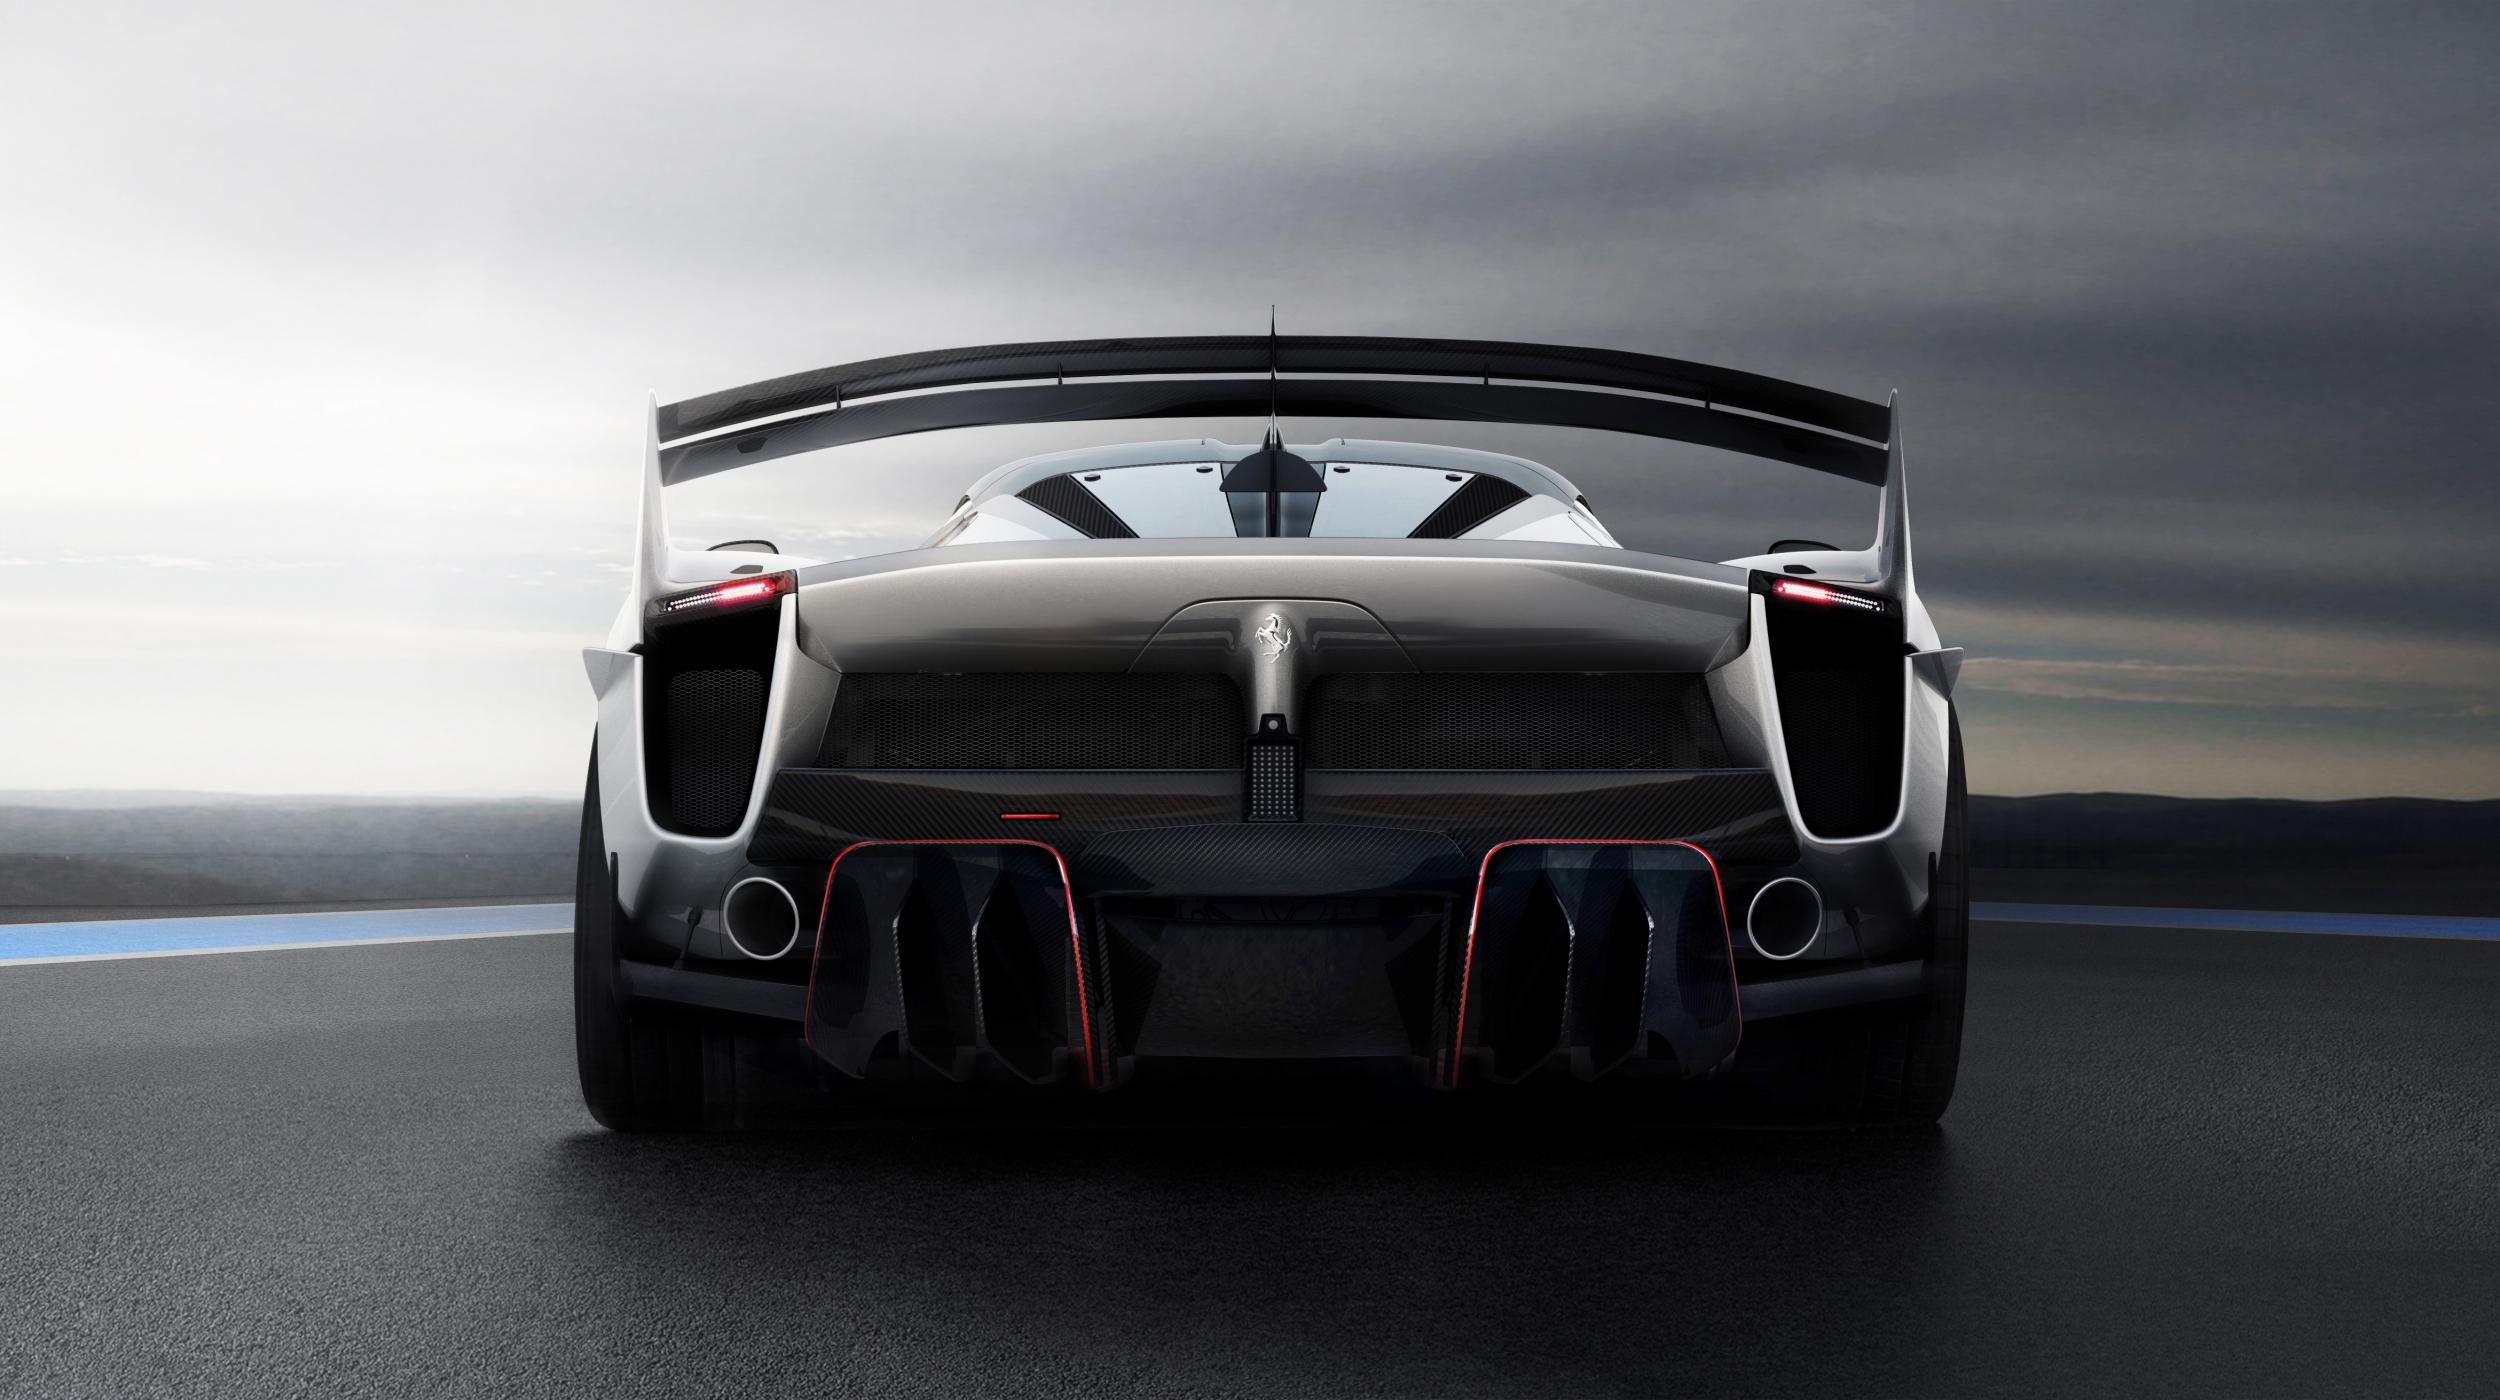 Ferrari FXX-K Evo rear